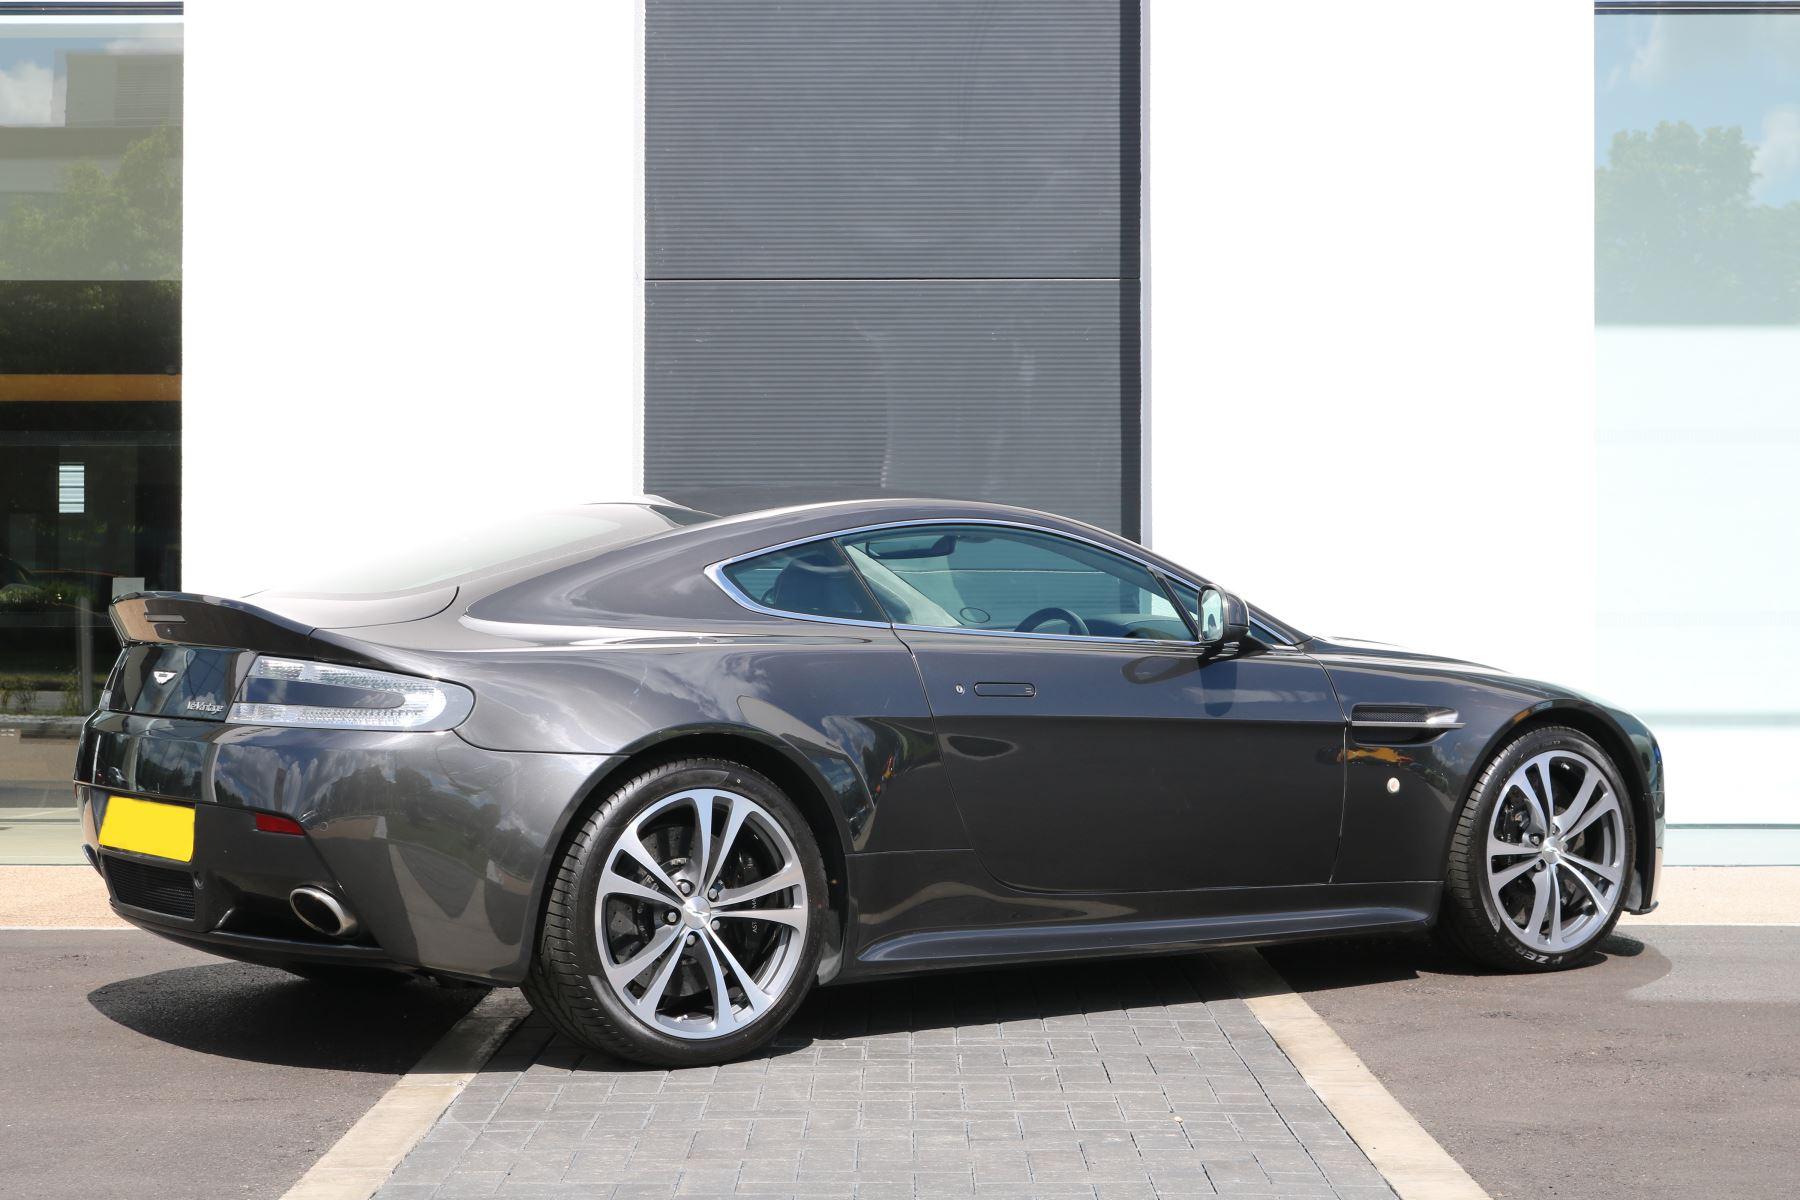 Aston Martin V12 Vantage 2dr image 6